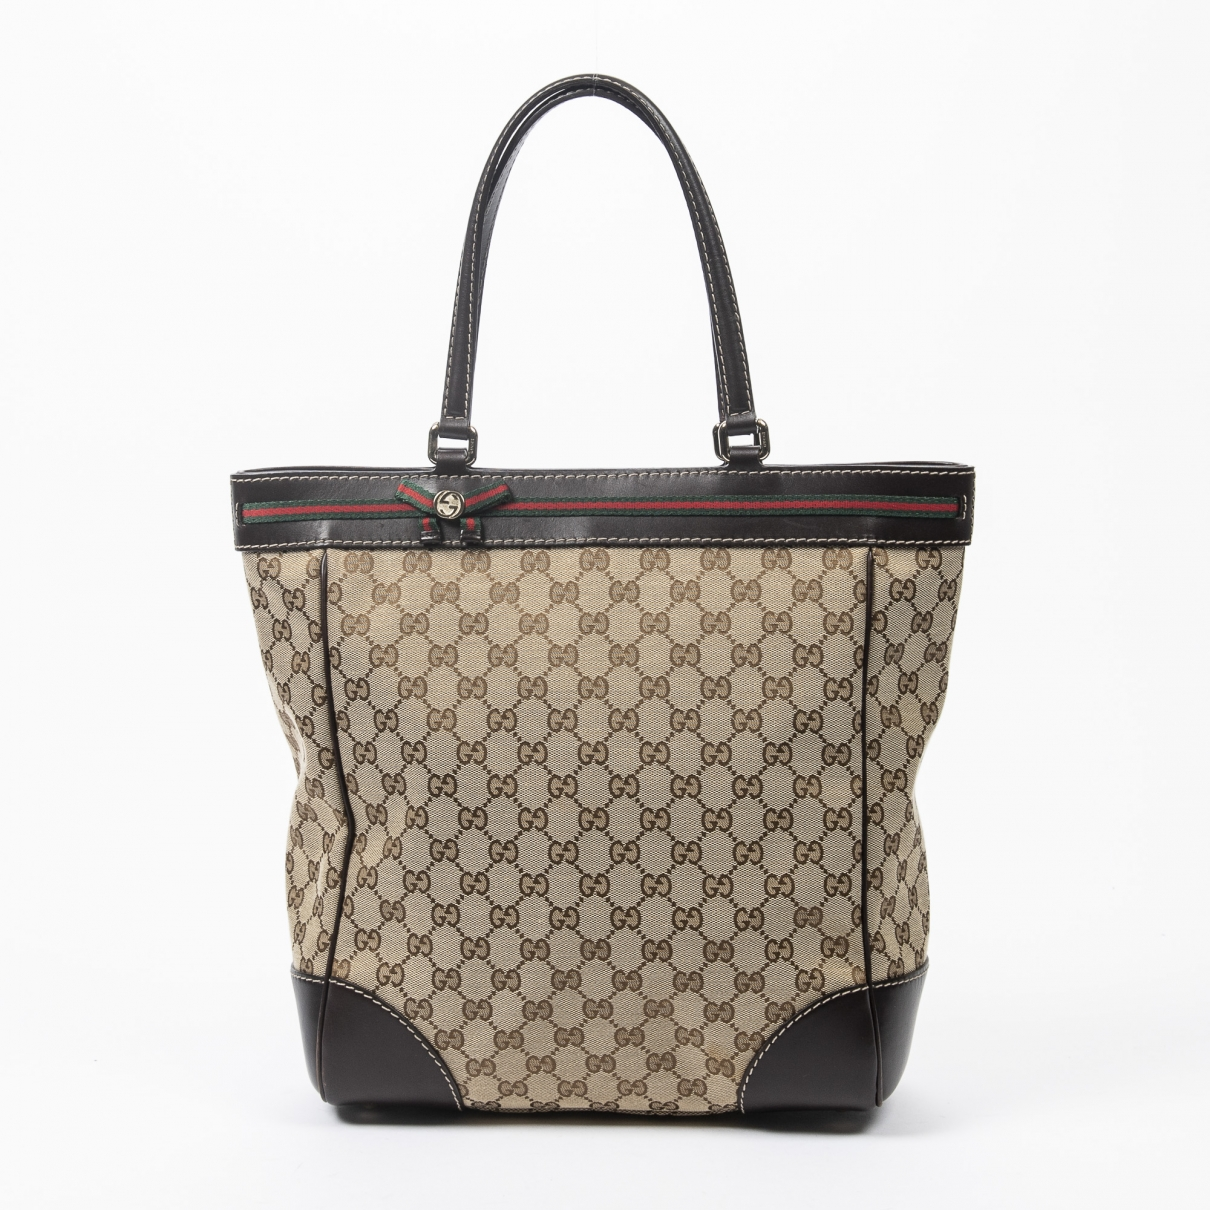 Gucci \N Brown Cotton handbag for Women \N